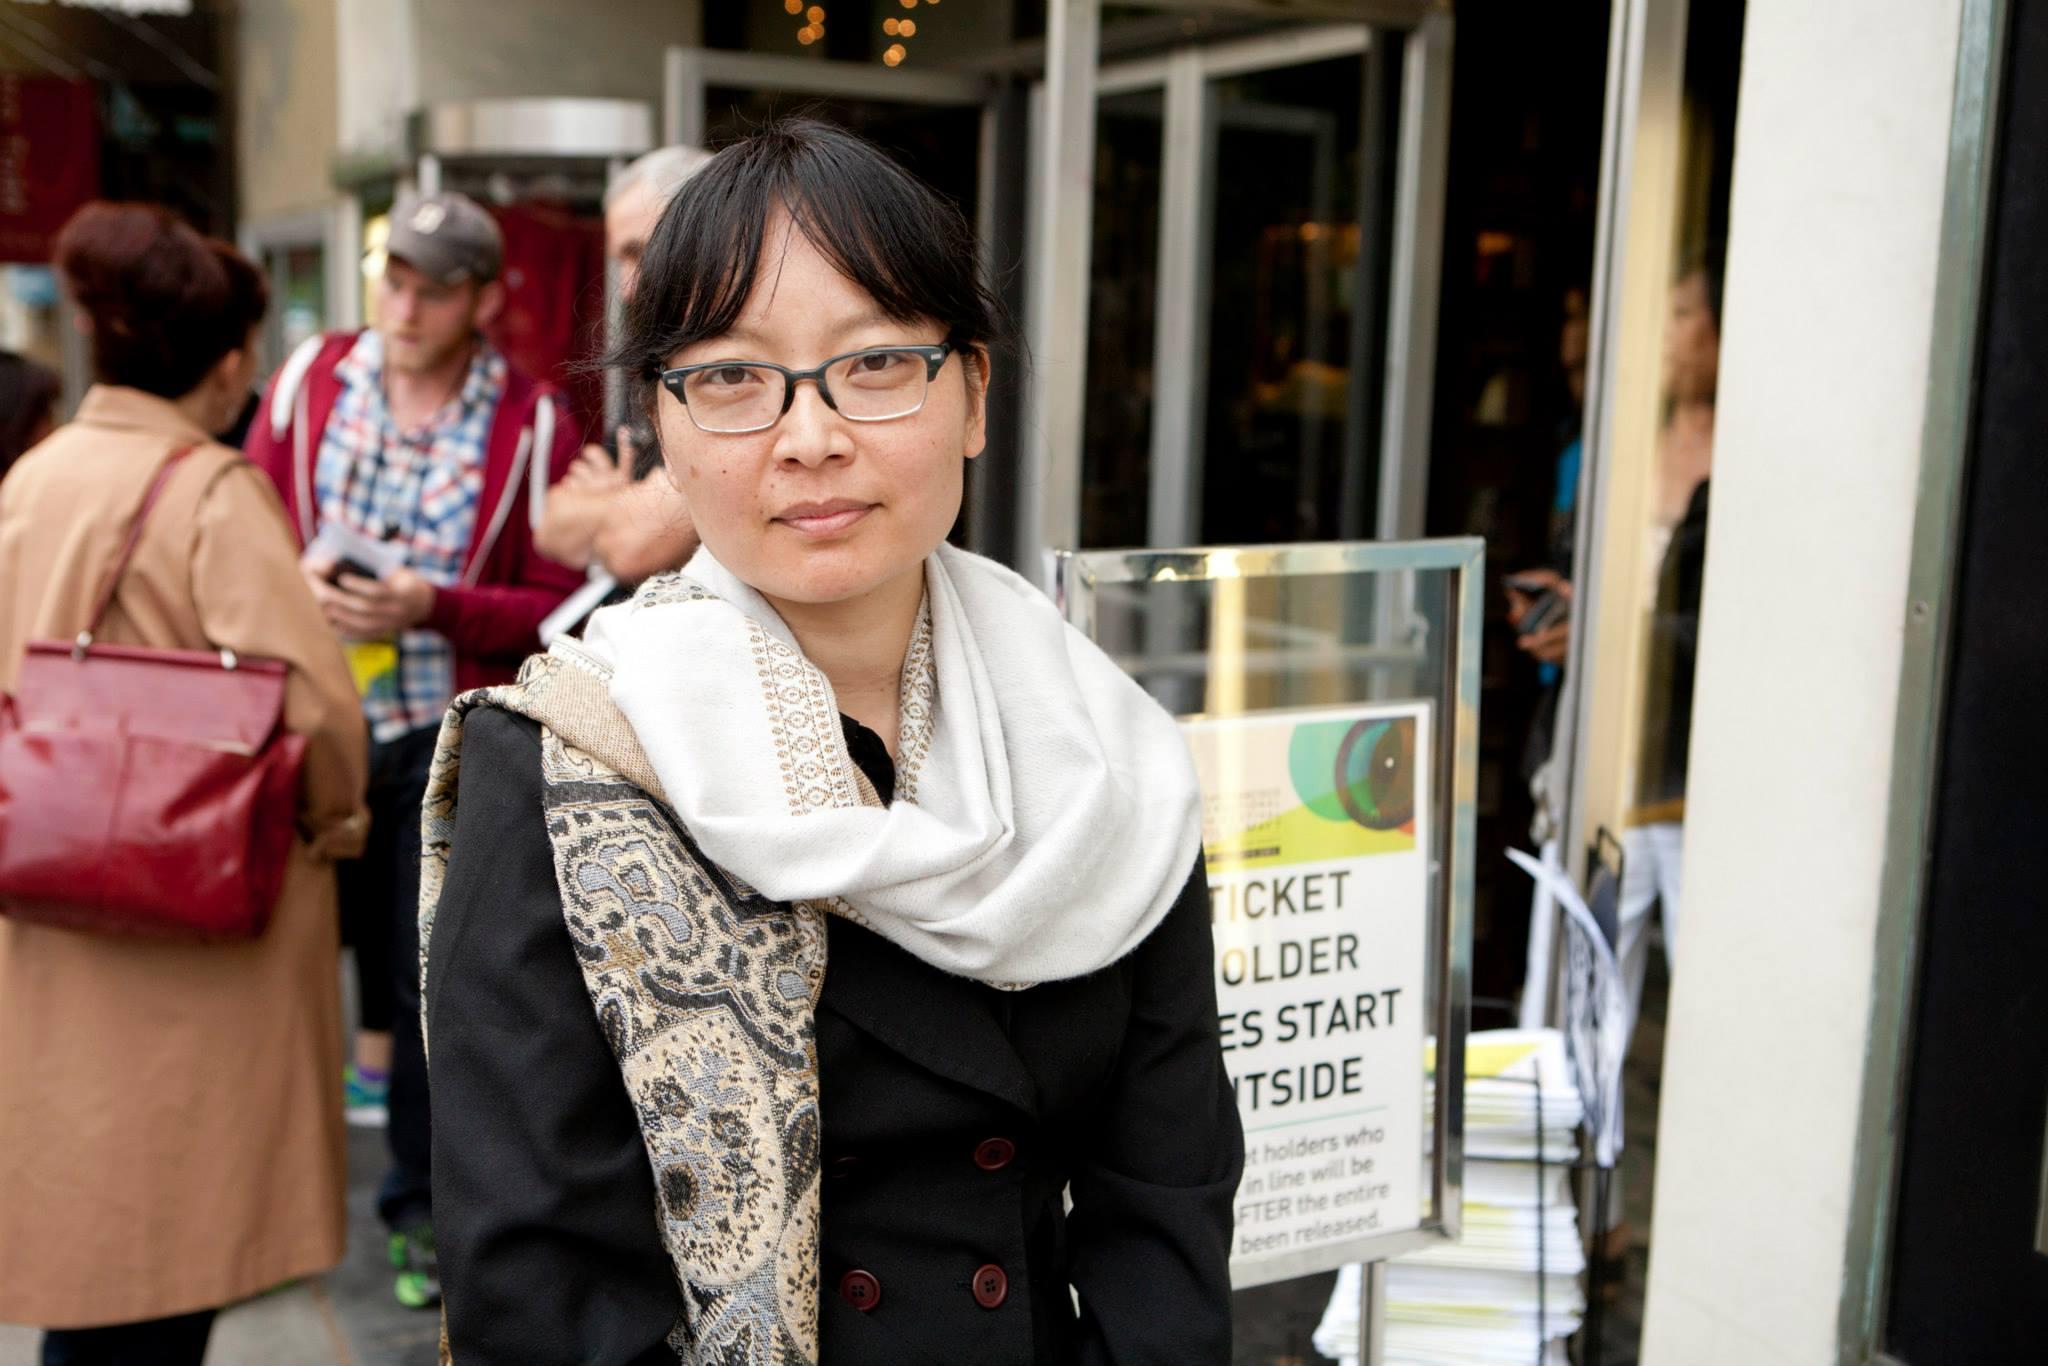 Jennifer Phang, director of Advantageous